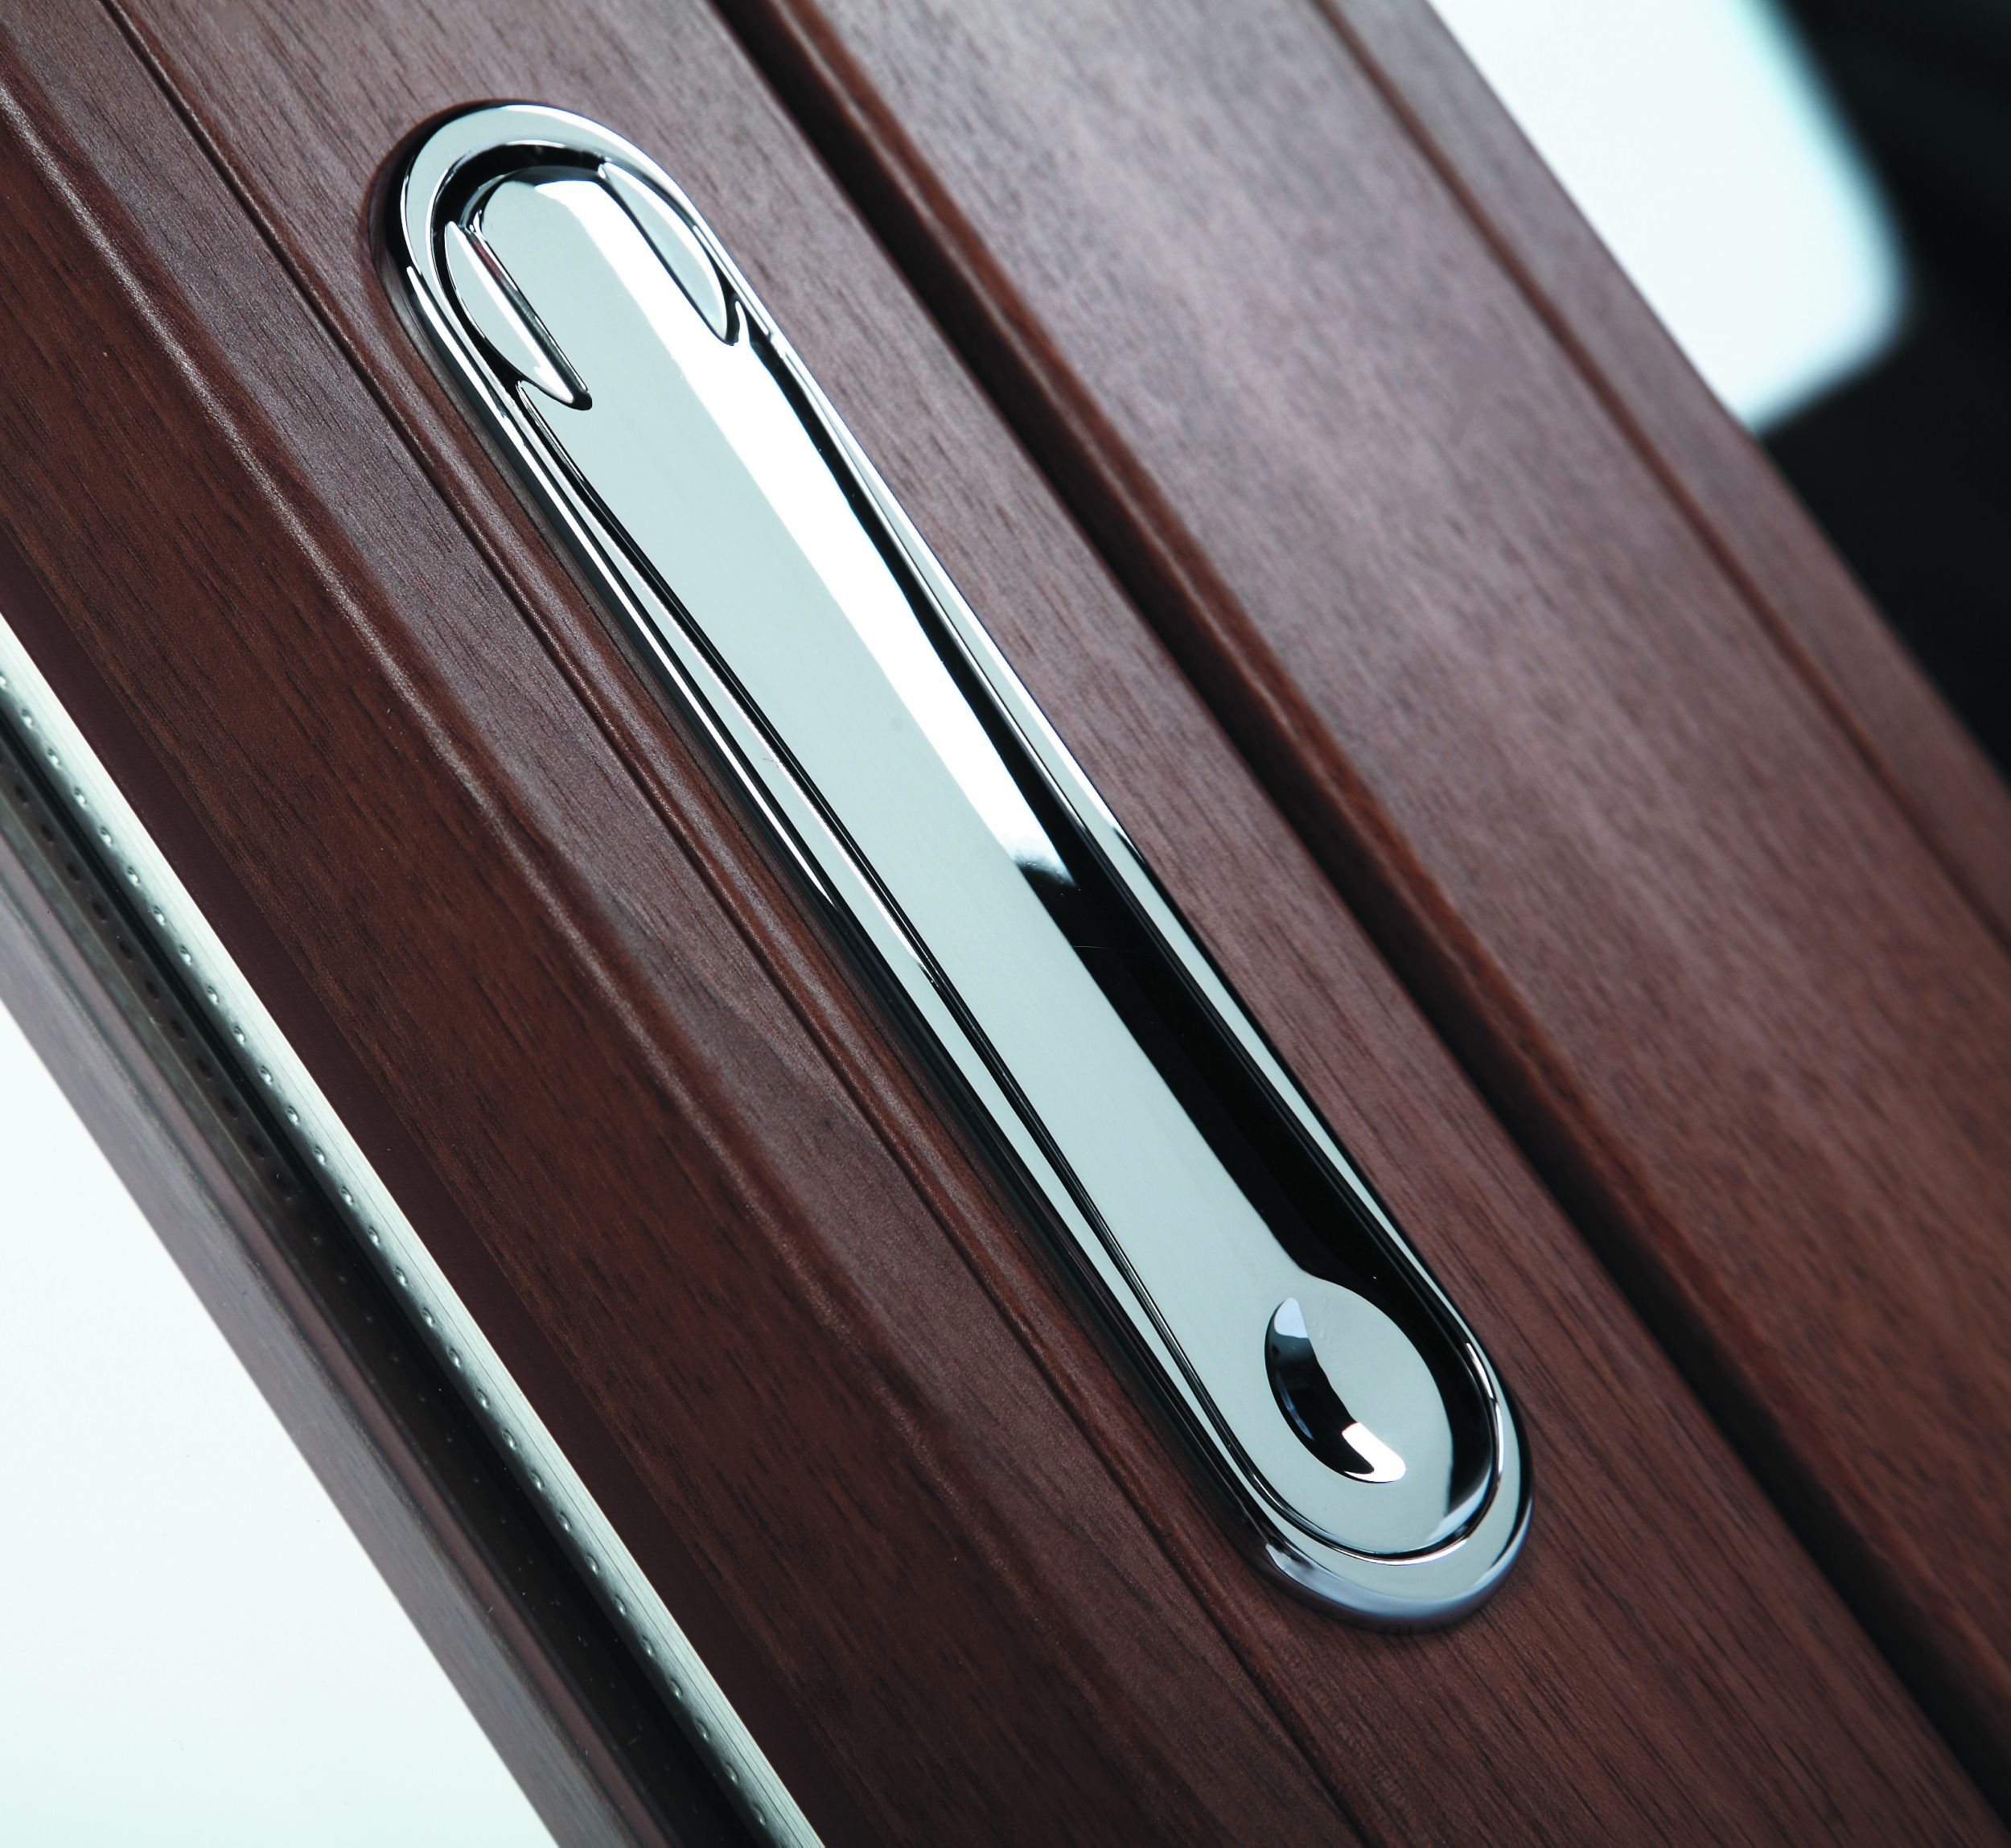 Infissi in pvc oknoplast accessori d 39 eccellenza - Ricambi per maniglie finestre in alluminio ...